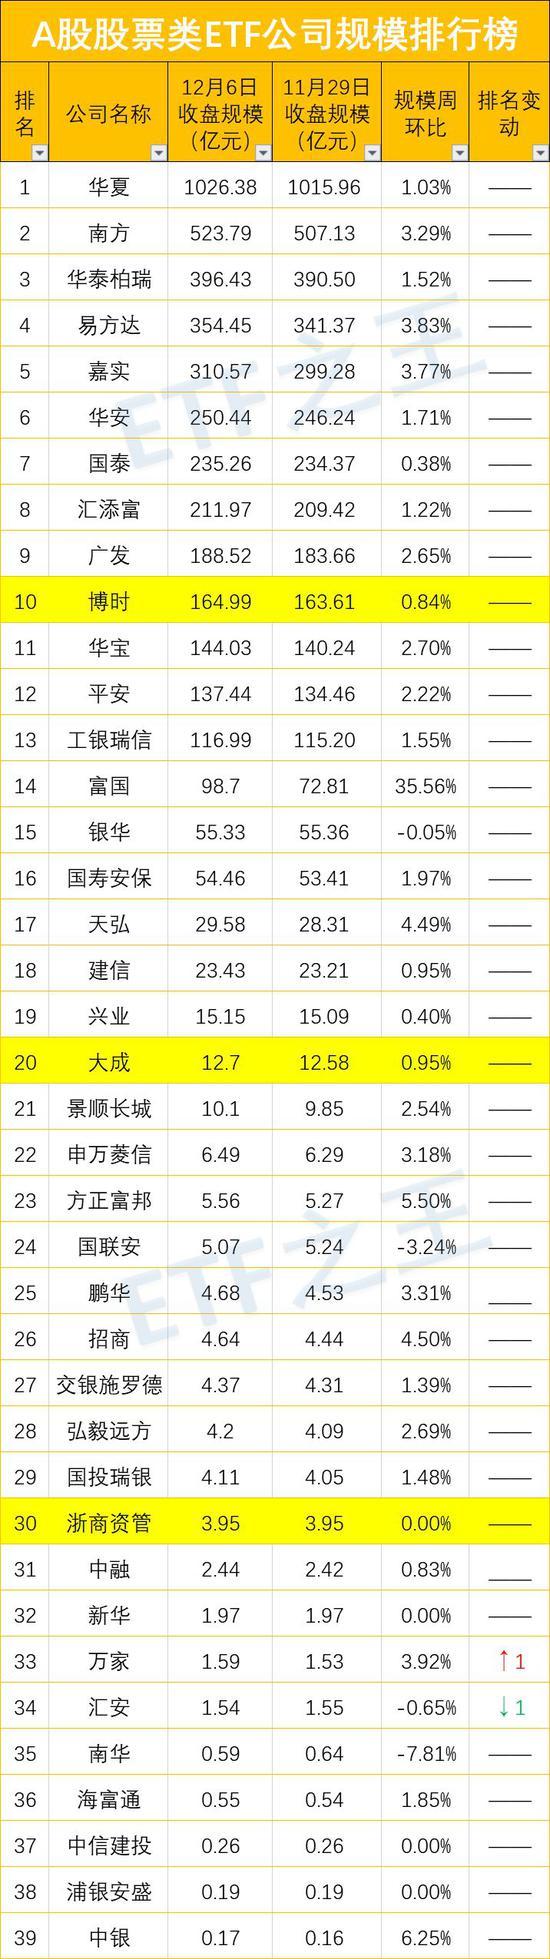 A股股票ETF规模排行榜及公司排行榜 最大ETF易主